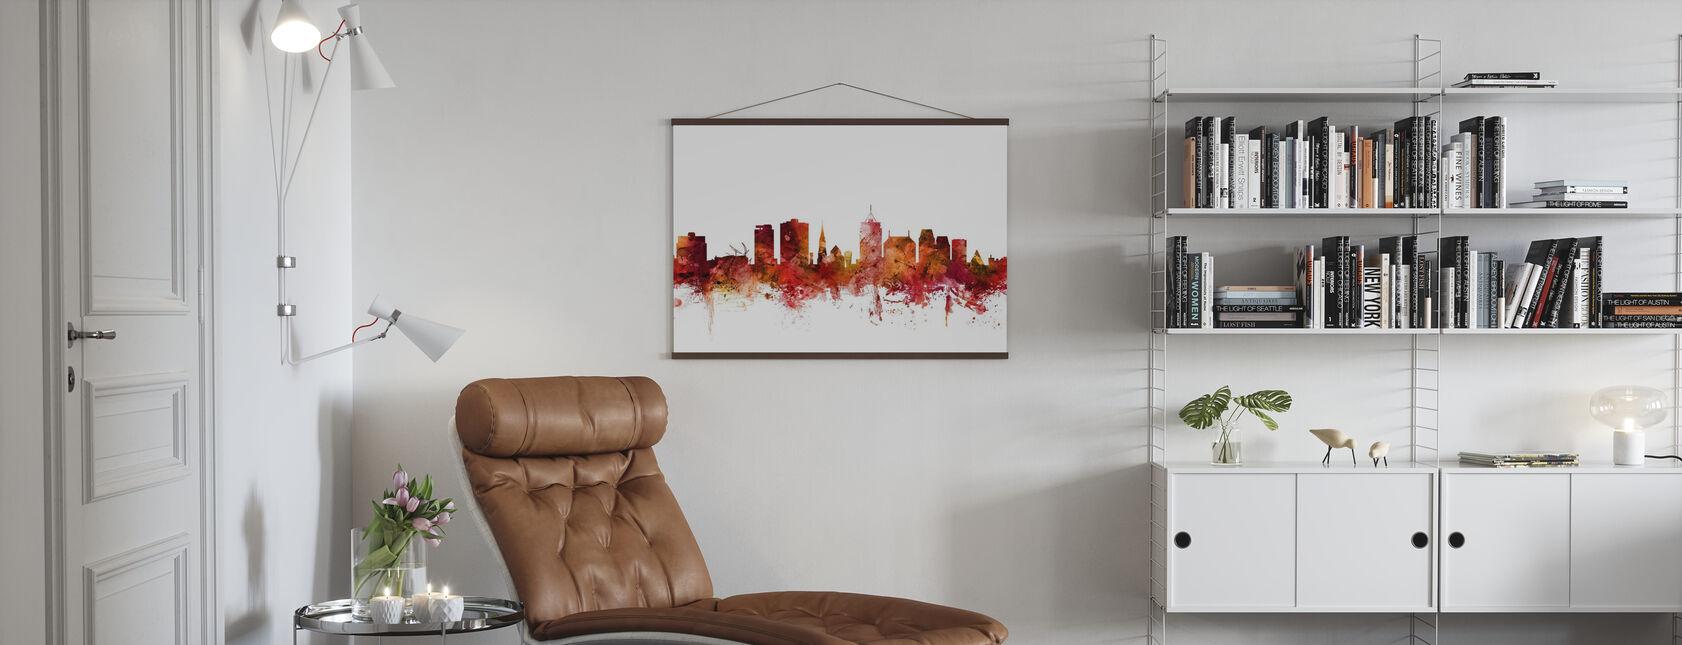 Christchurch New Zealand Skyline - Poster - Living Room